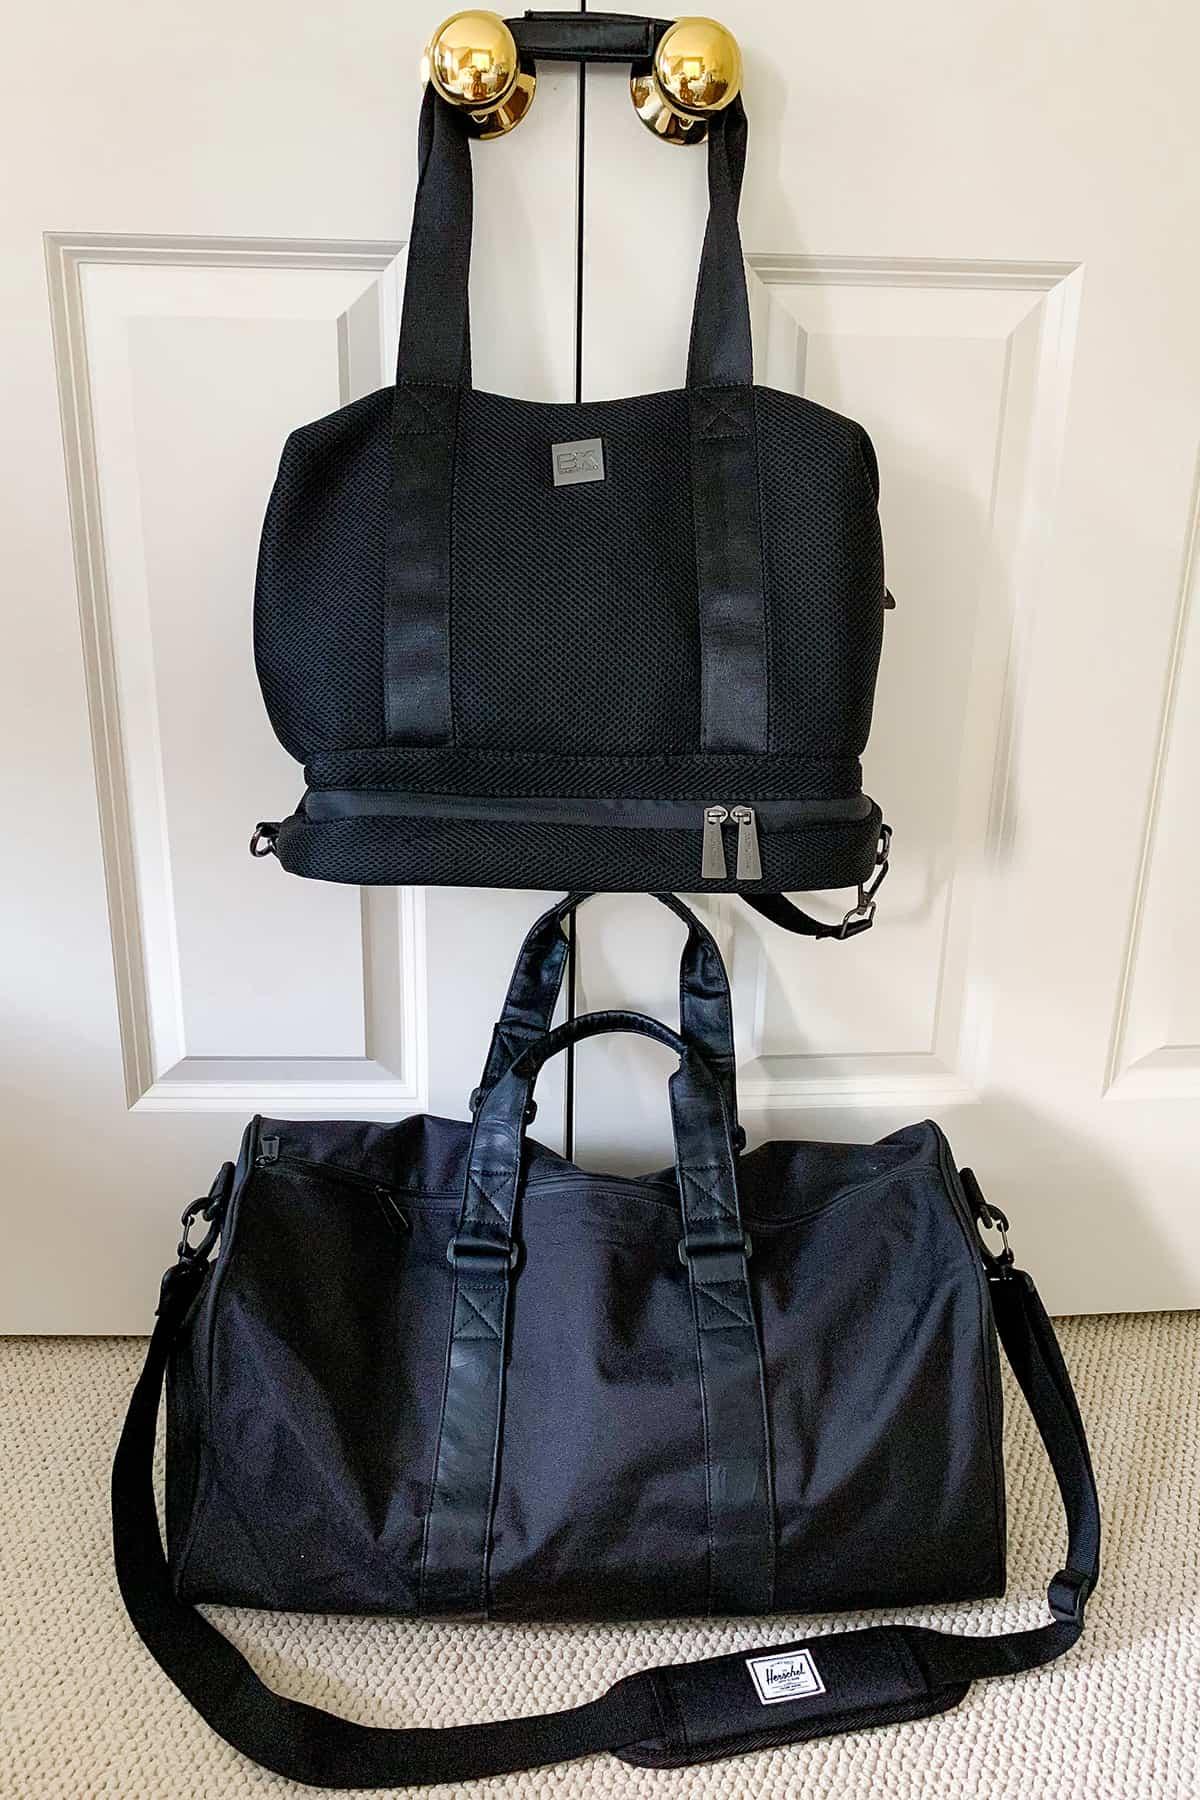 Katies Bliss Hospital Bag